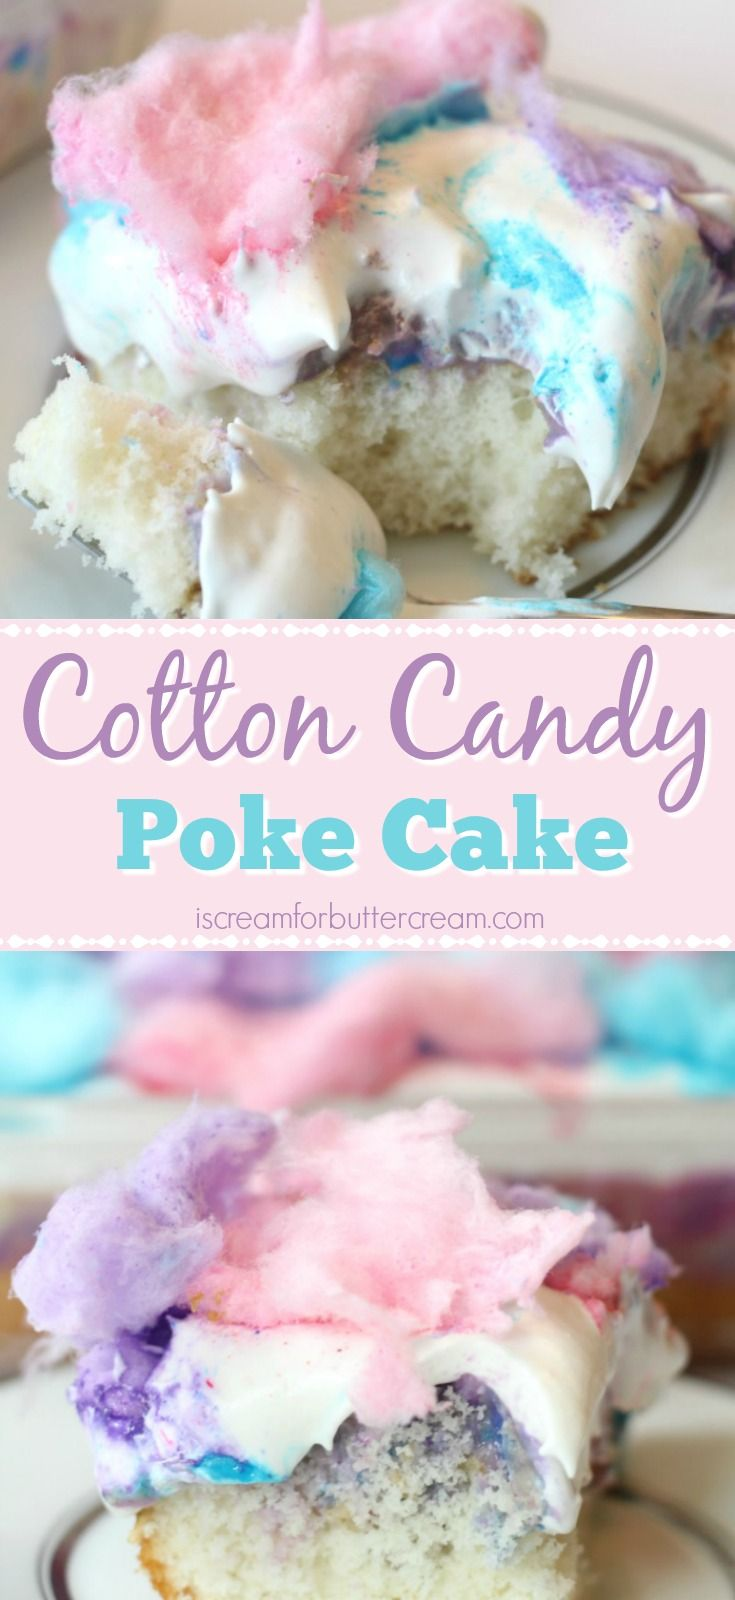 Cotton Candy Poke Cake Recipe I Scream For Buttercream Blog